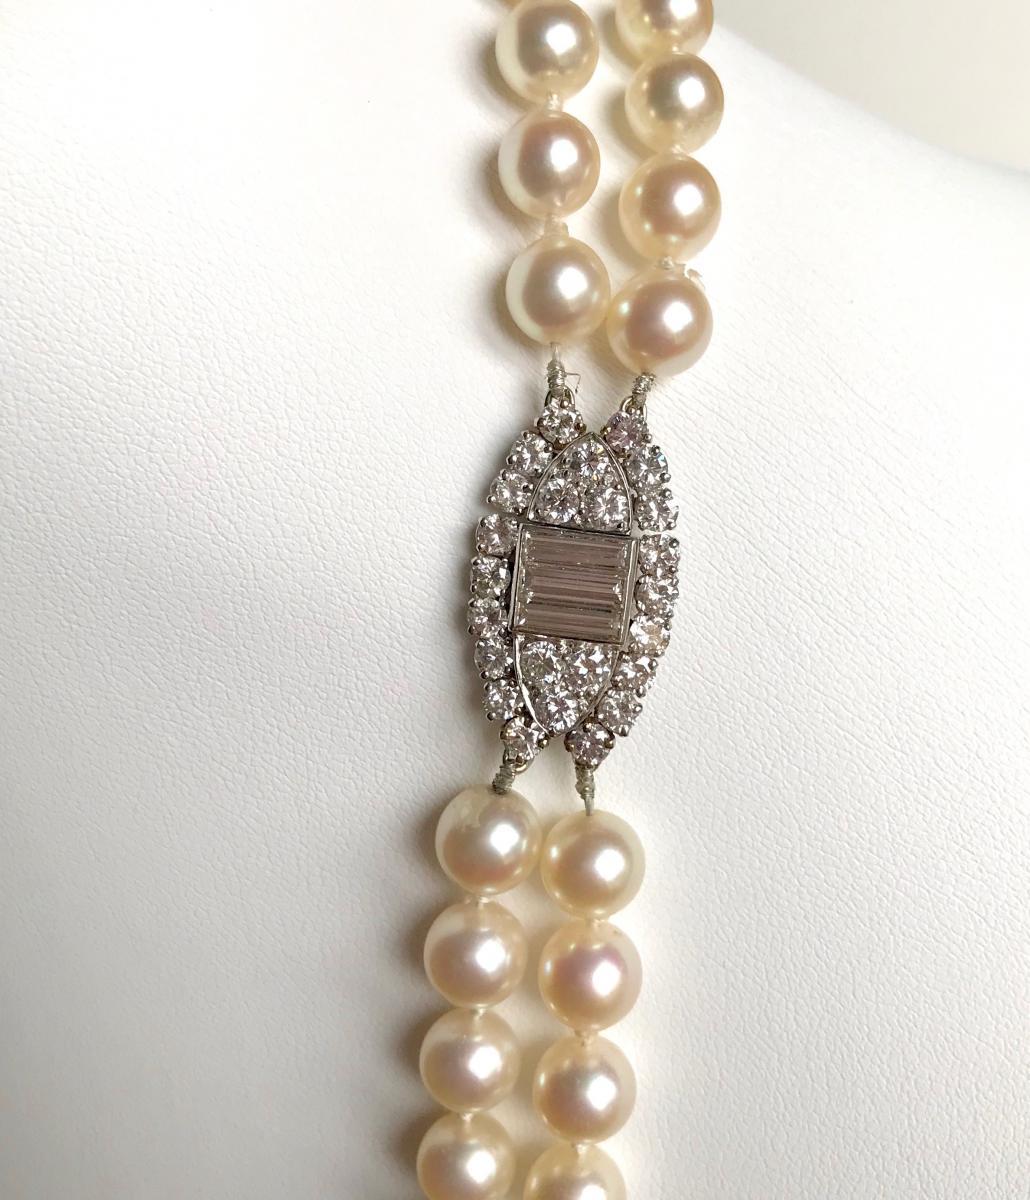 Necklace Pearl Necklace 2 Rows Van Cleef & Arpels-photo-2